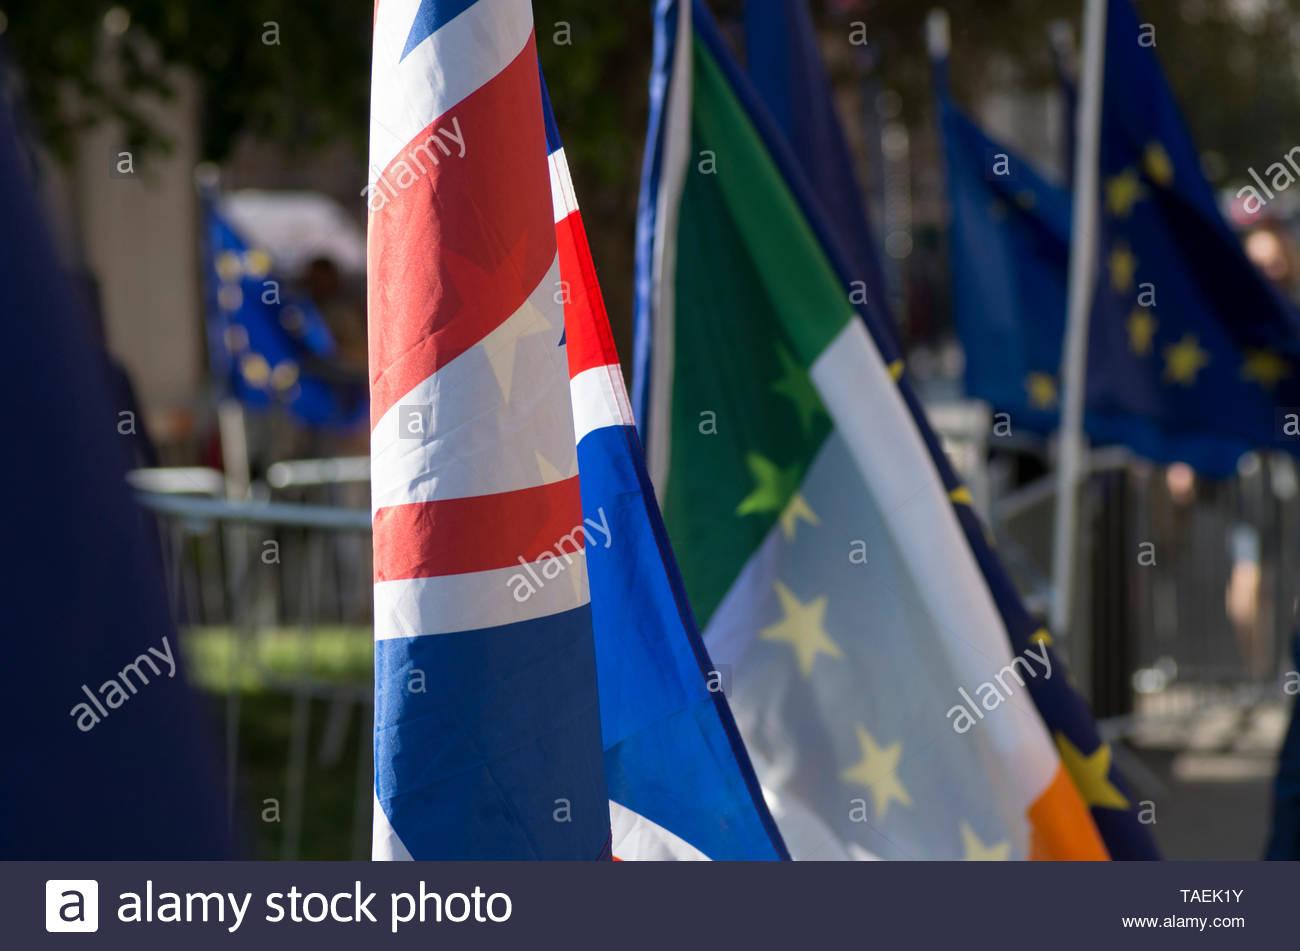 London, UK. 23 April 2019. Union jack, Irish tricolour and the EU flag flutter near parliament on European election day in the UK, Westminster, London.   © Stuart Walden/ Alamy - Stock Image